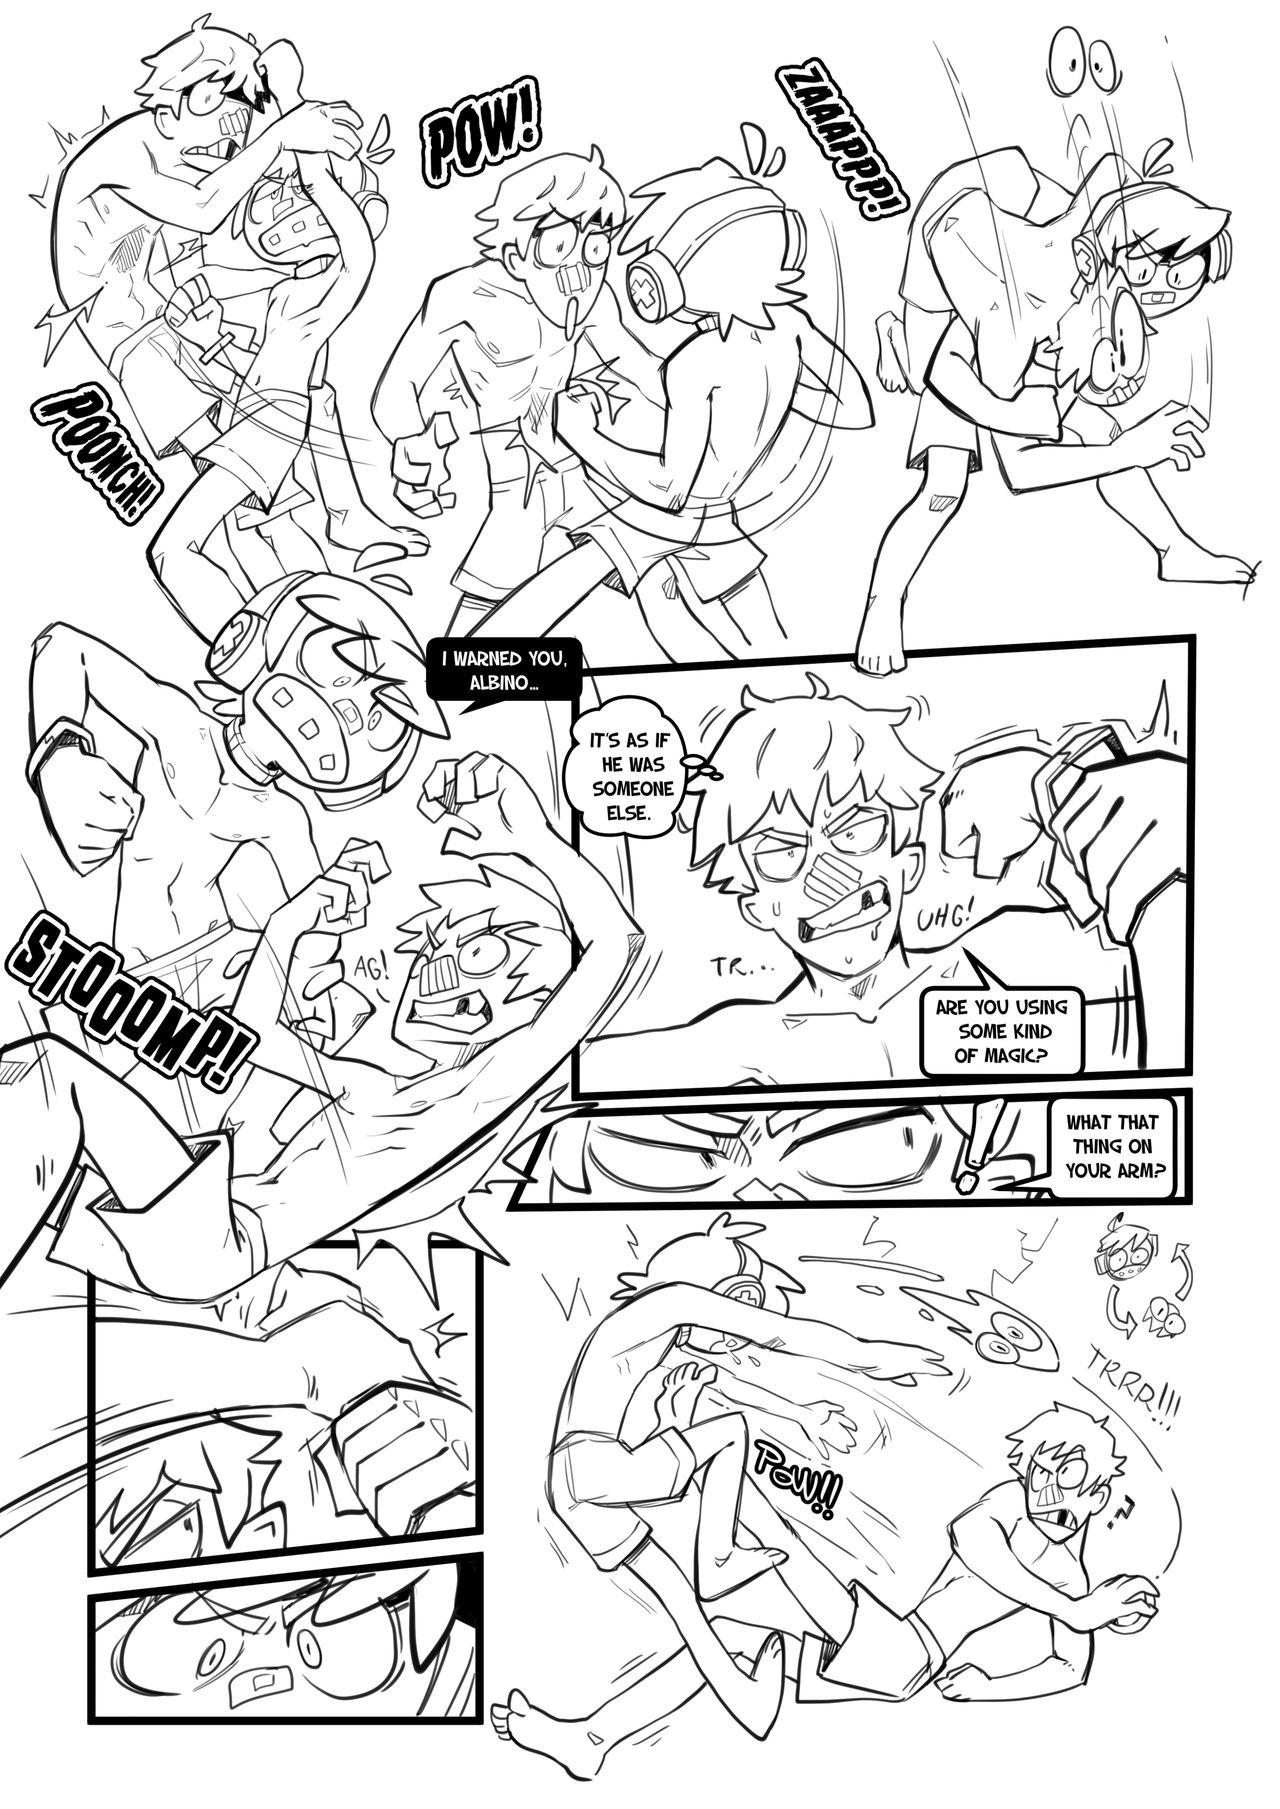 Skarpworld Chapter 8 Hentai 23